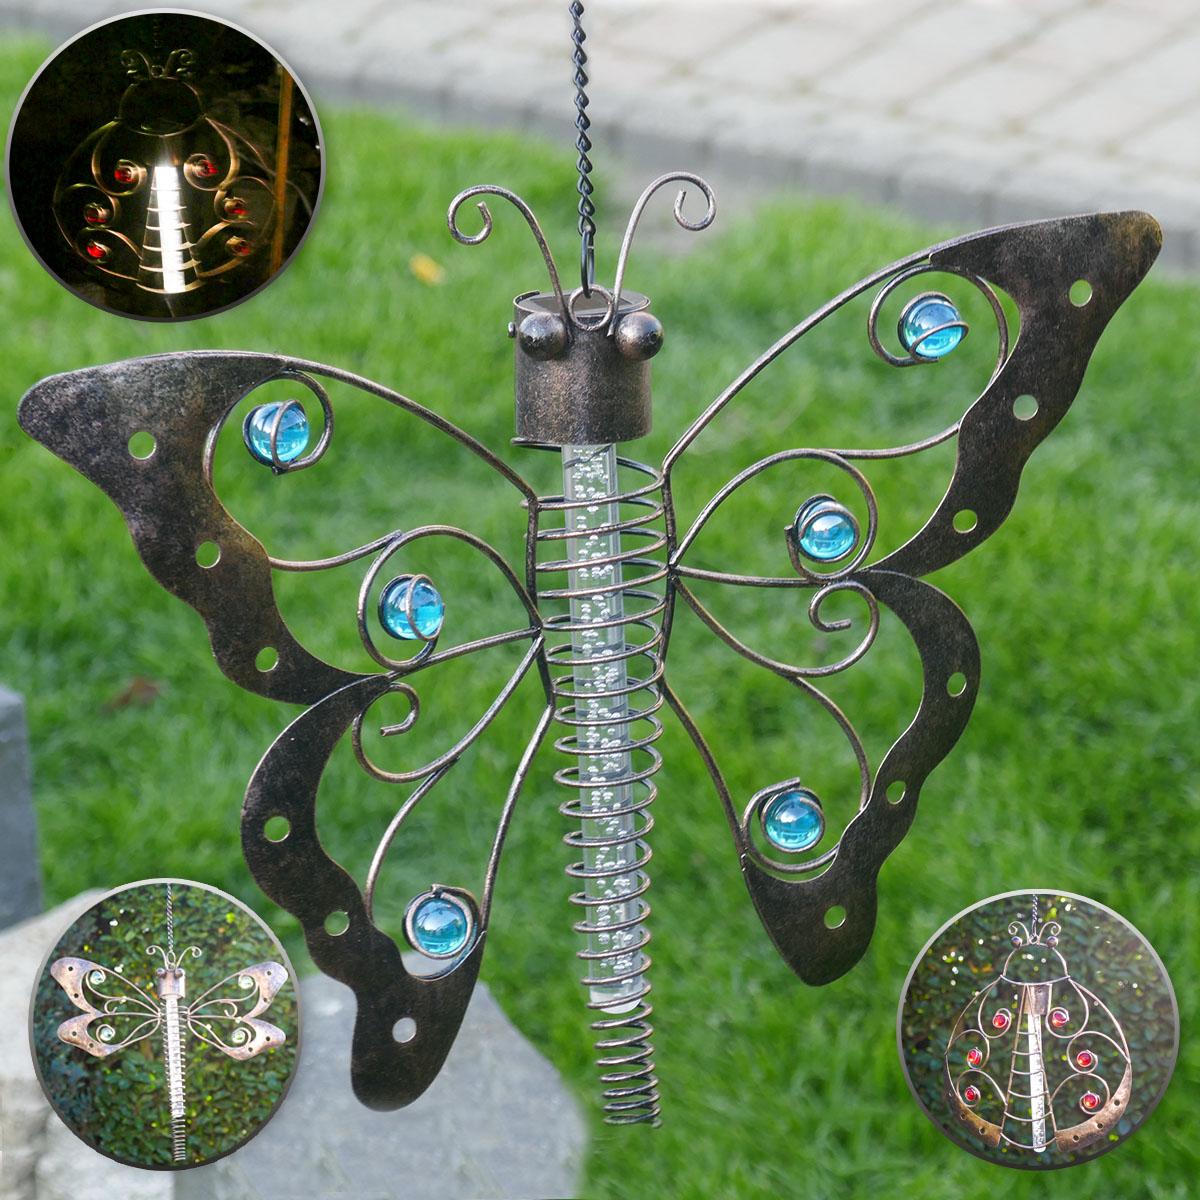 Dekorative Solar-Lampe aus Metall Image